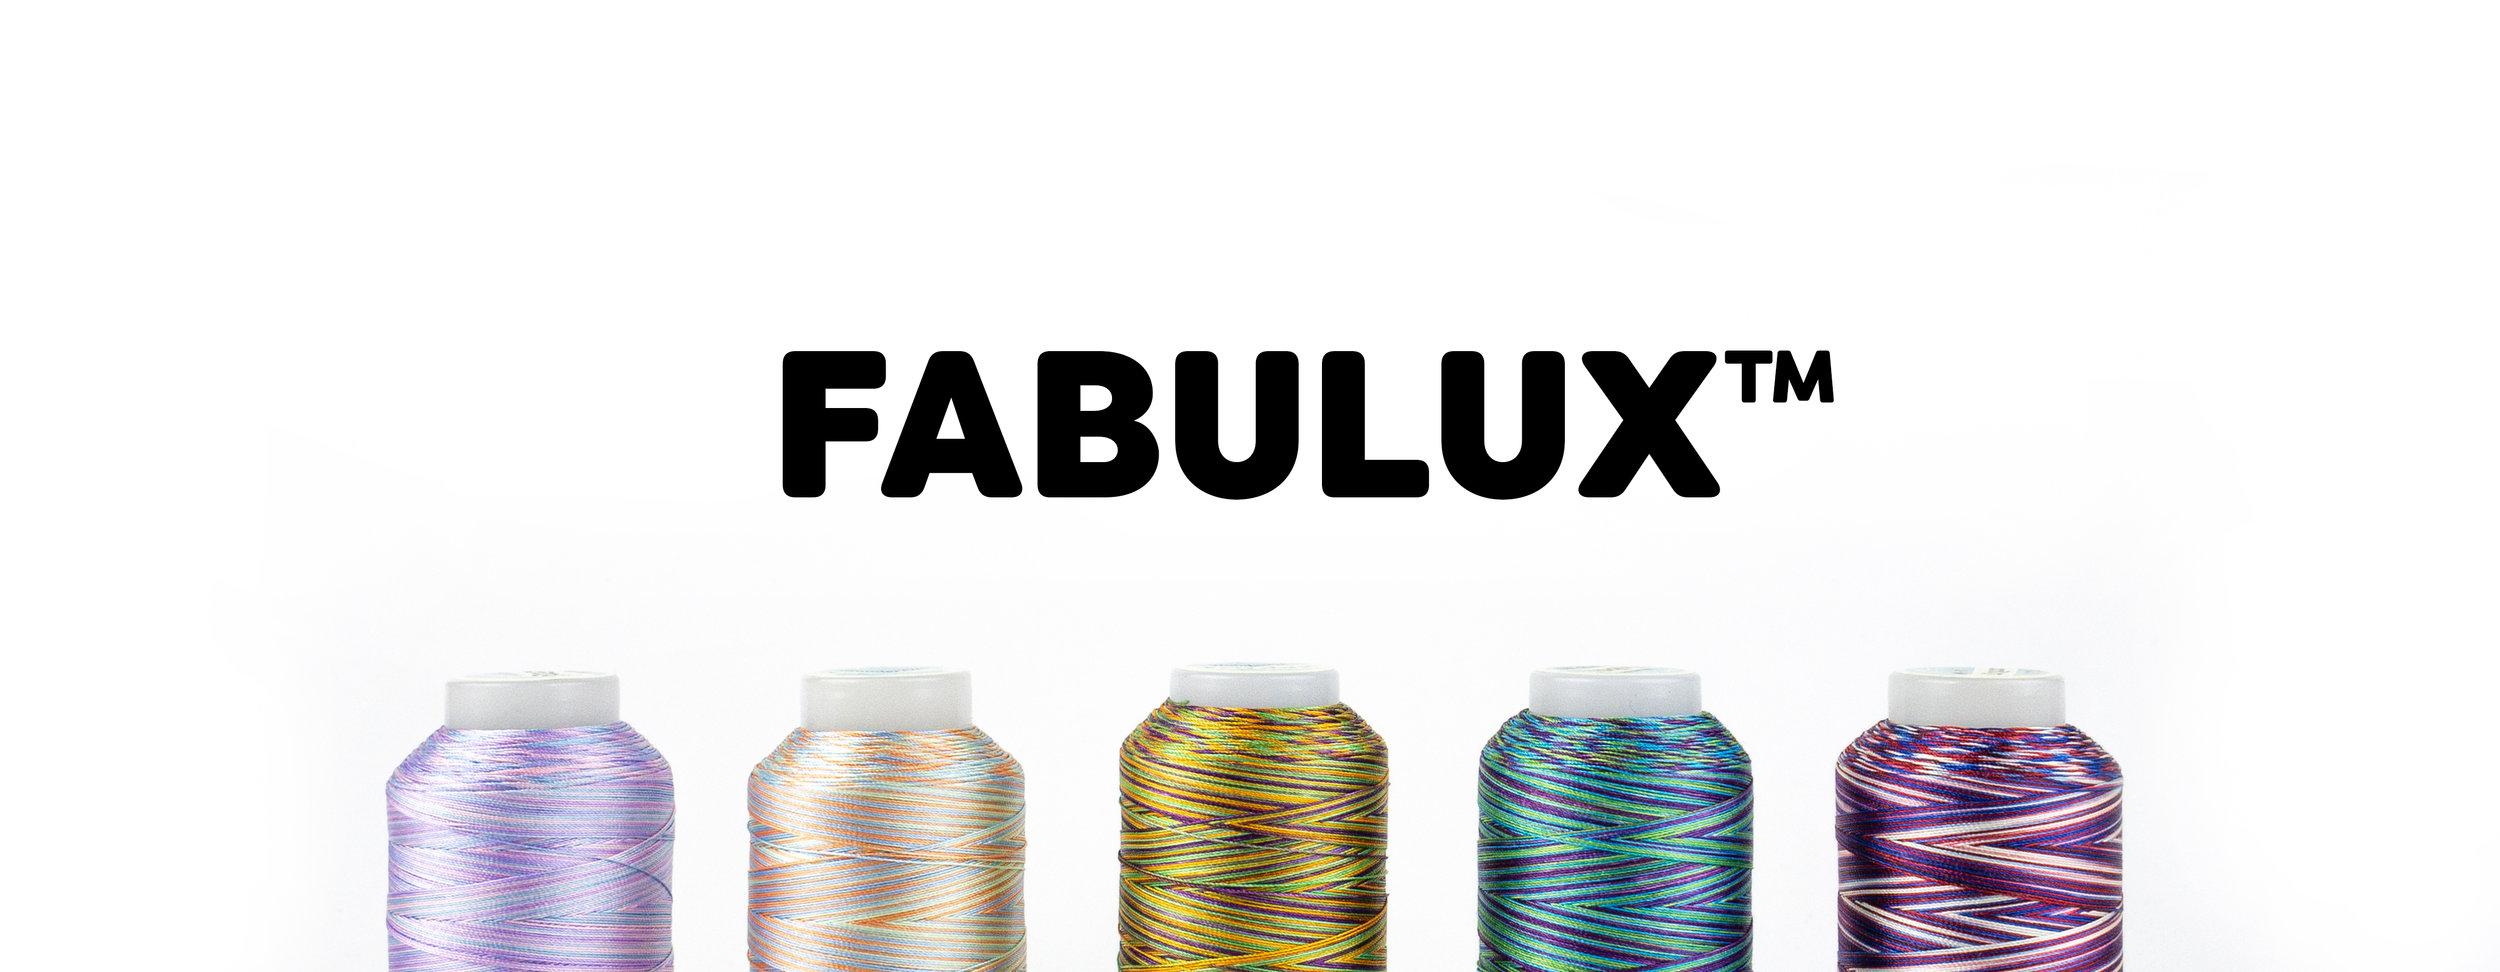 FabuLux-banner.jpg